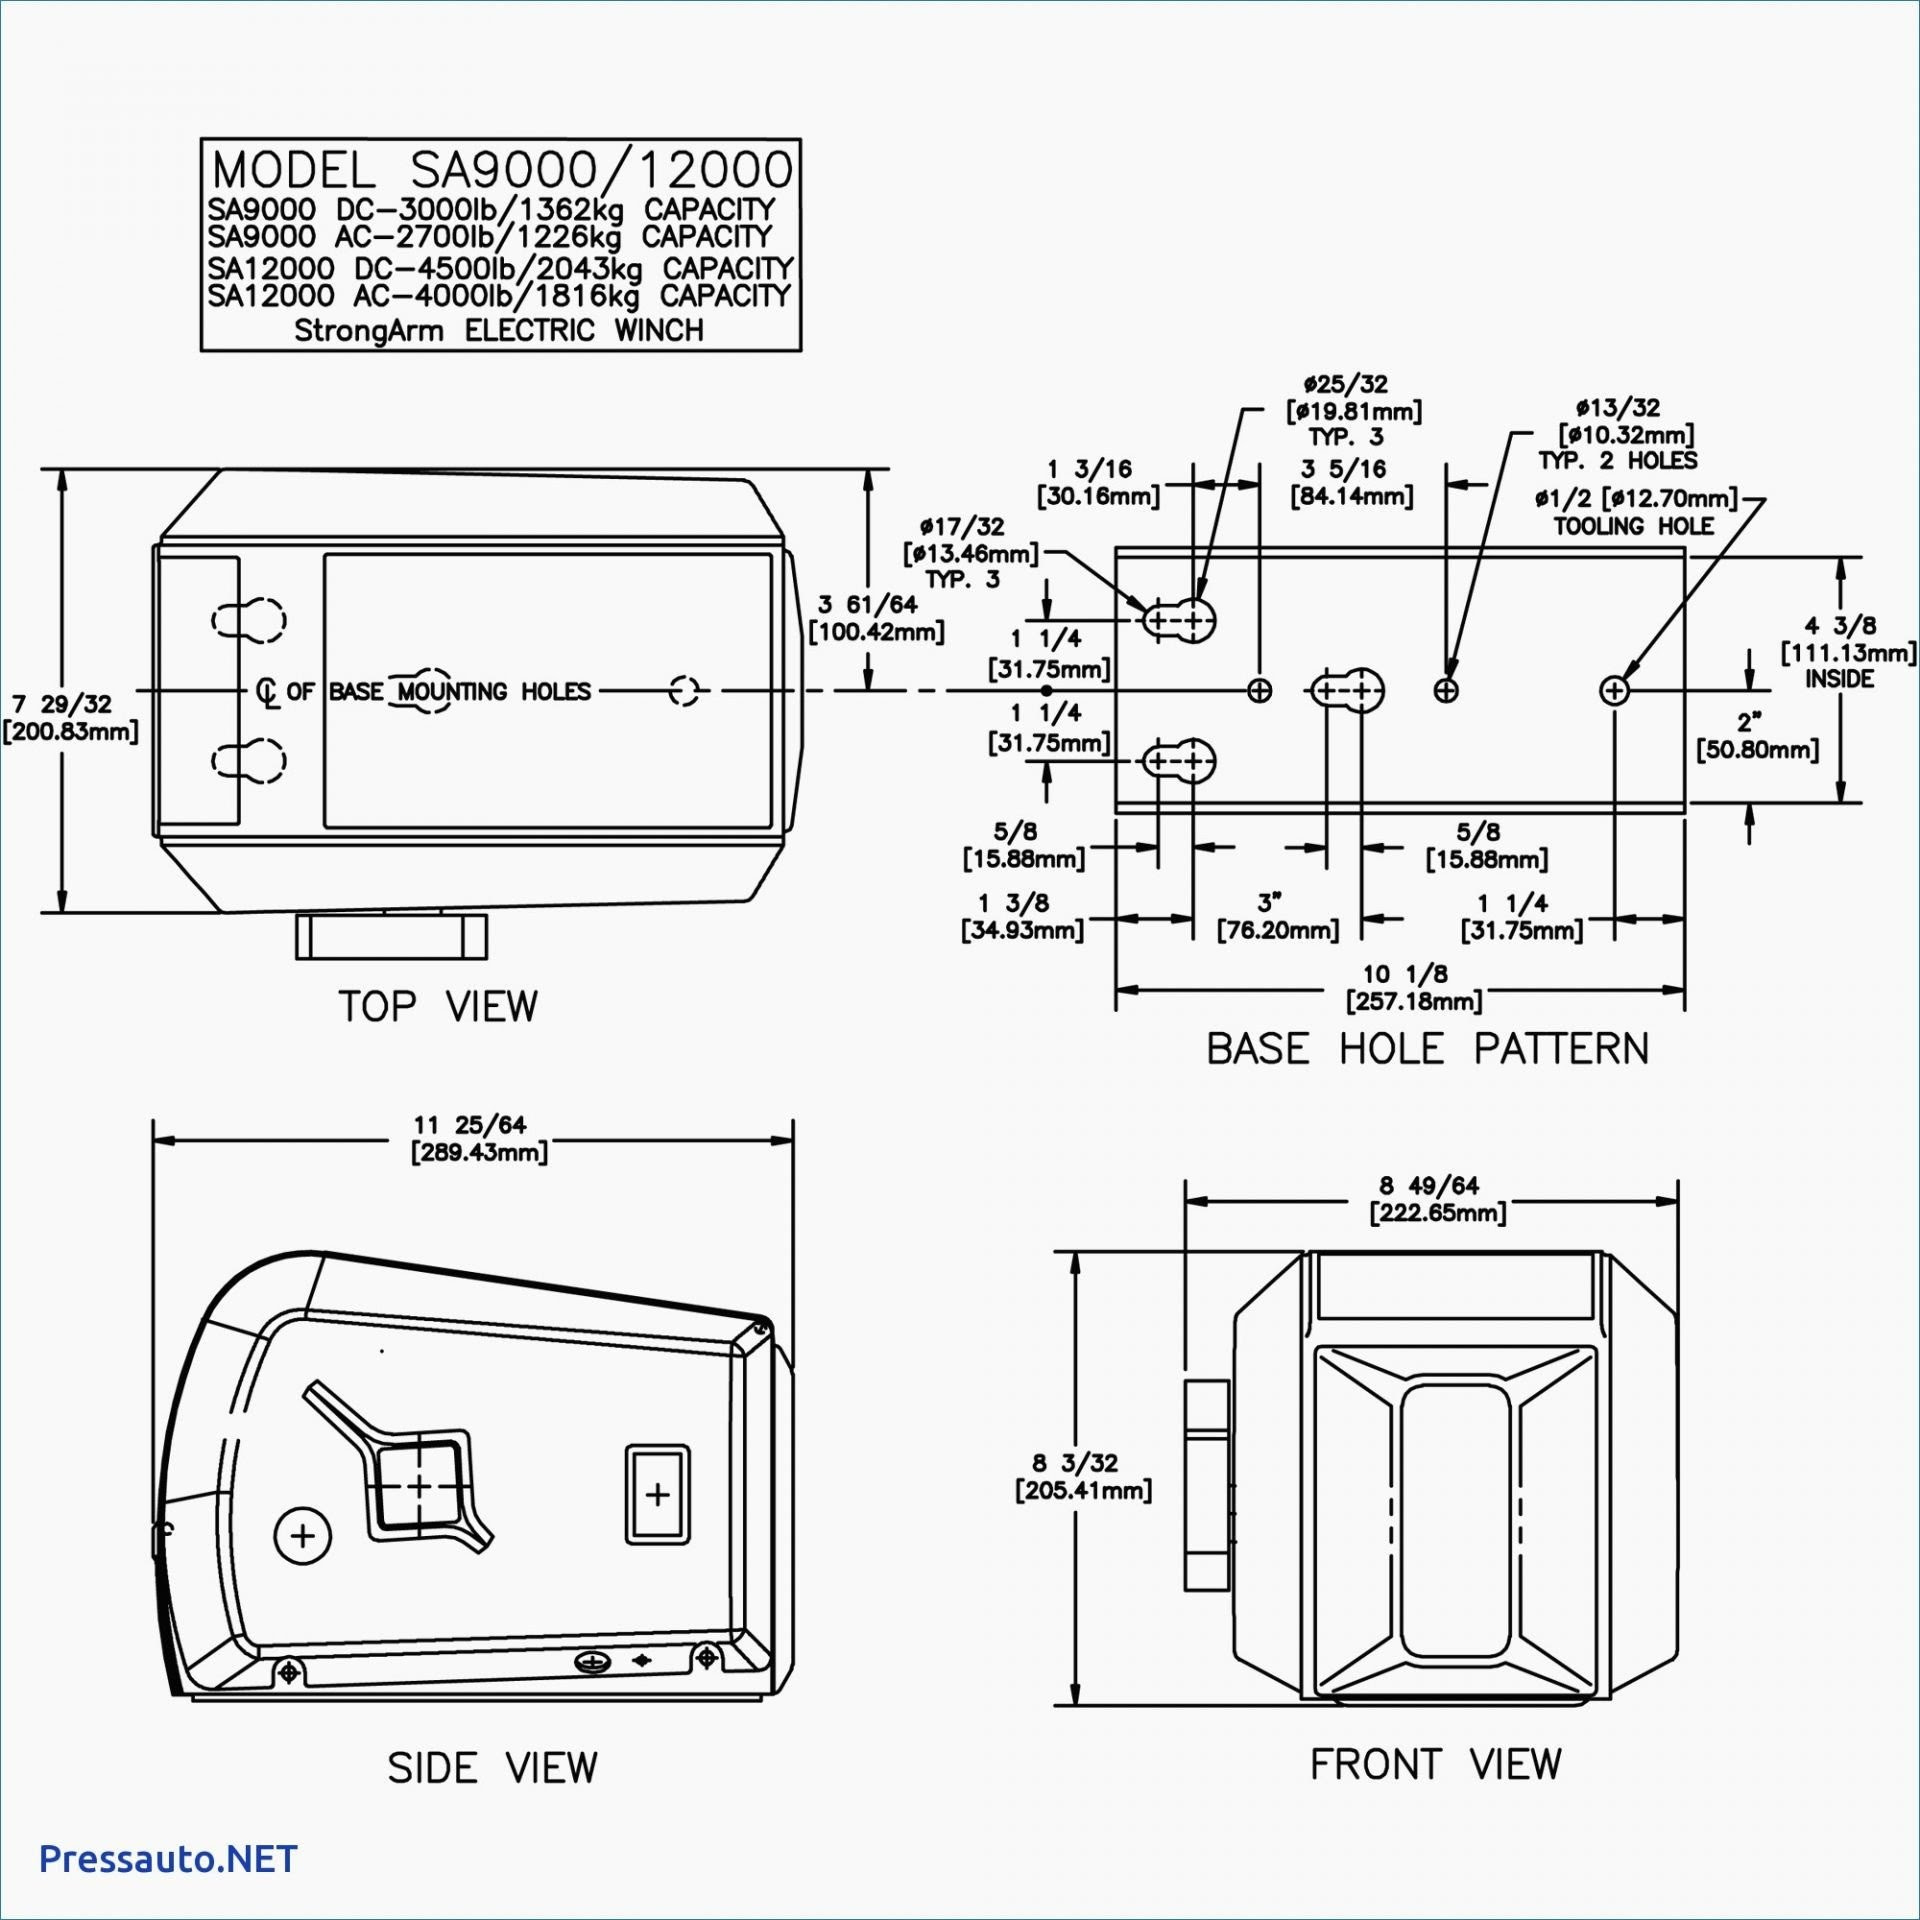 Warn M8000 Winch Wiring Diagram - General Wiring Diagram